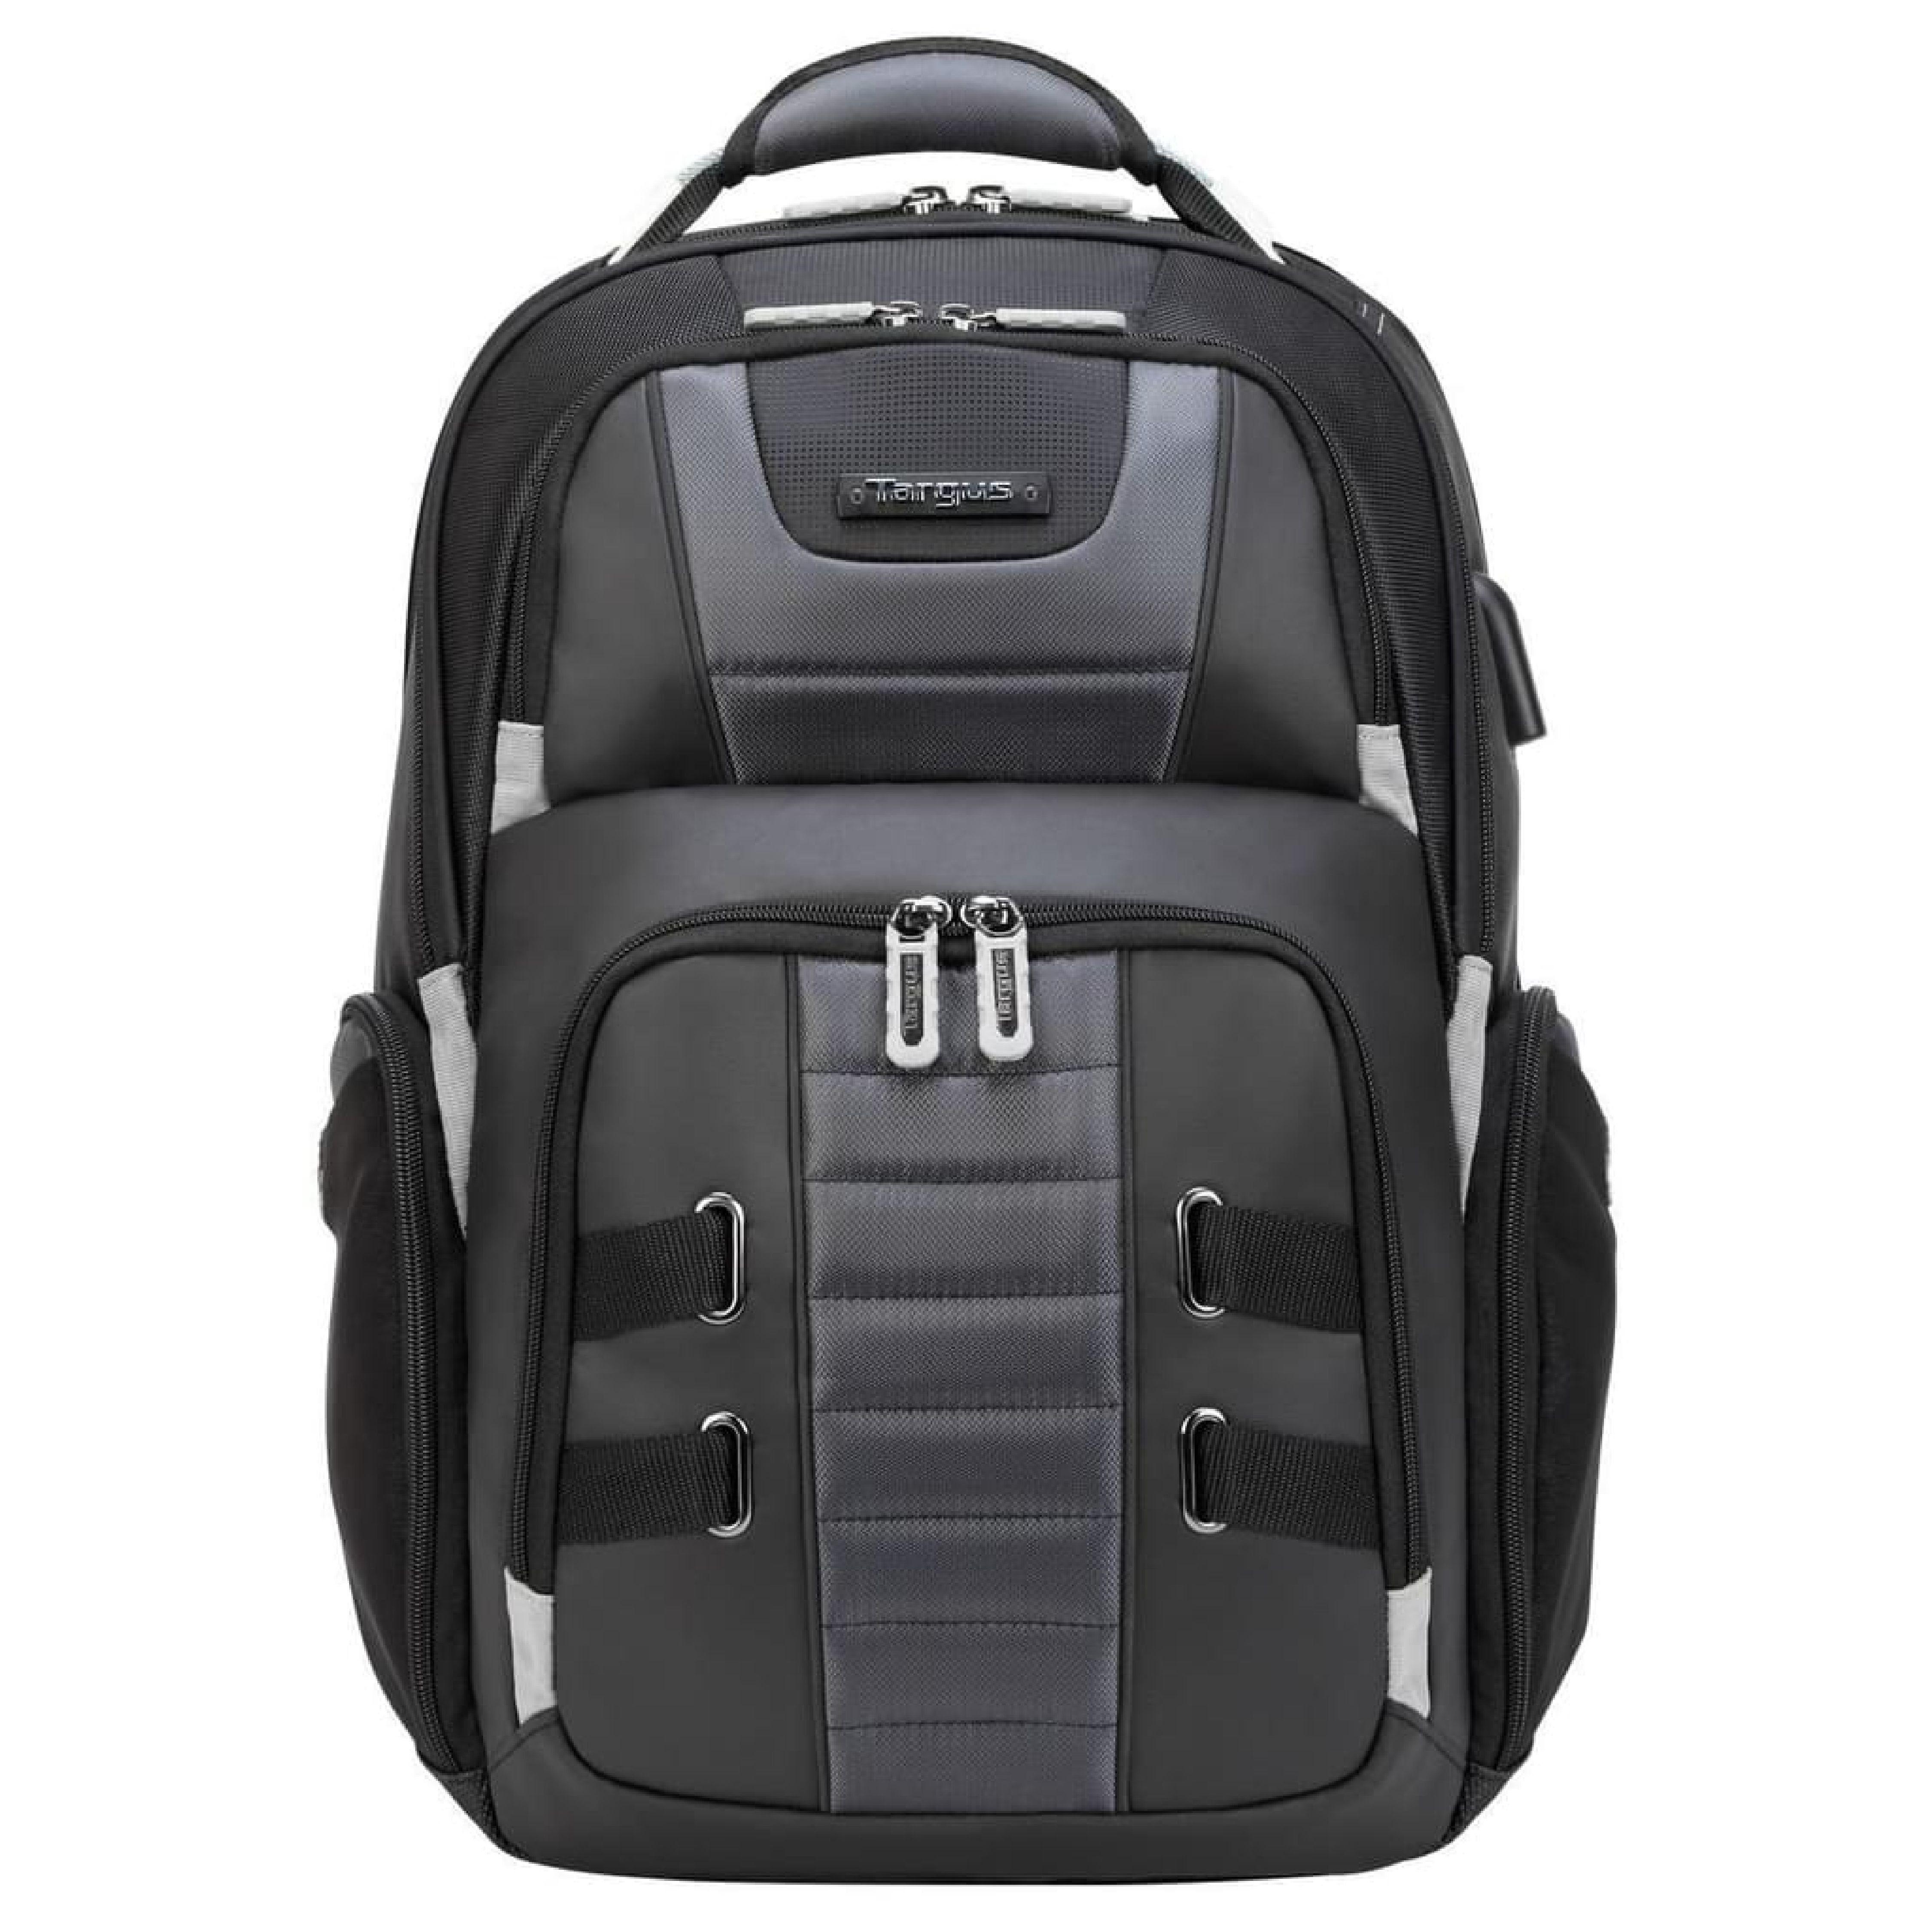 "TARGUS Targus DrifterTrek 15.6-17.3 USB Laptop Backpack »Rucksack für max 43,9 cm 17,3"" geeignet«"